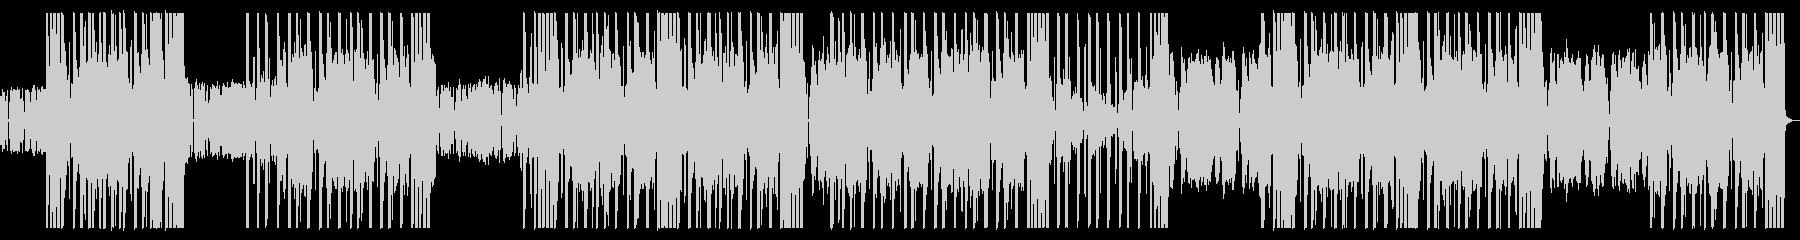 Advanced EDM Trap, Club Beat's unreproduced waveform